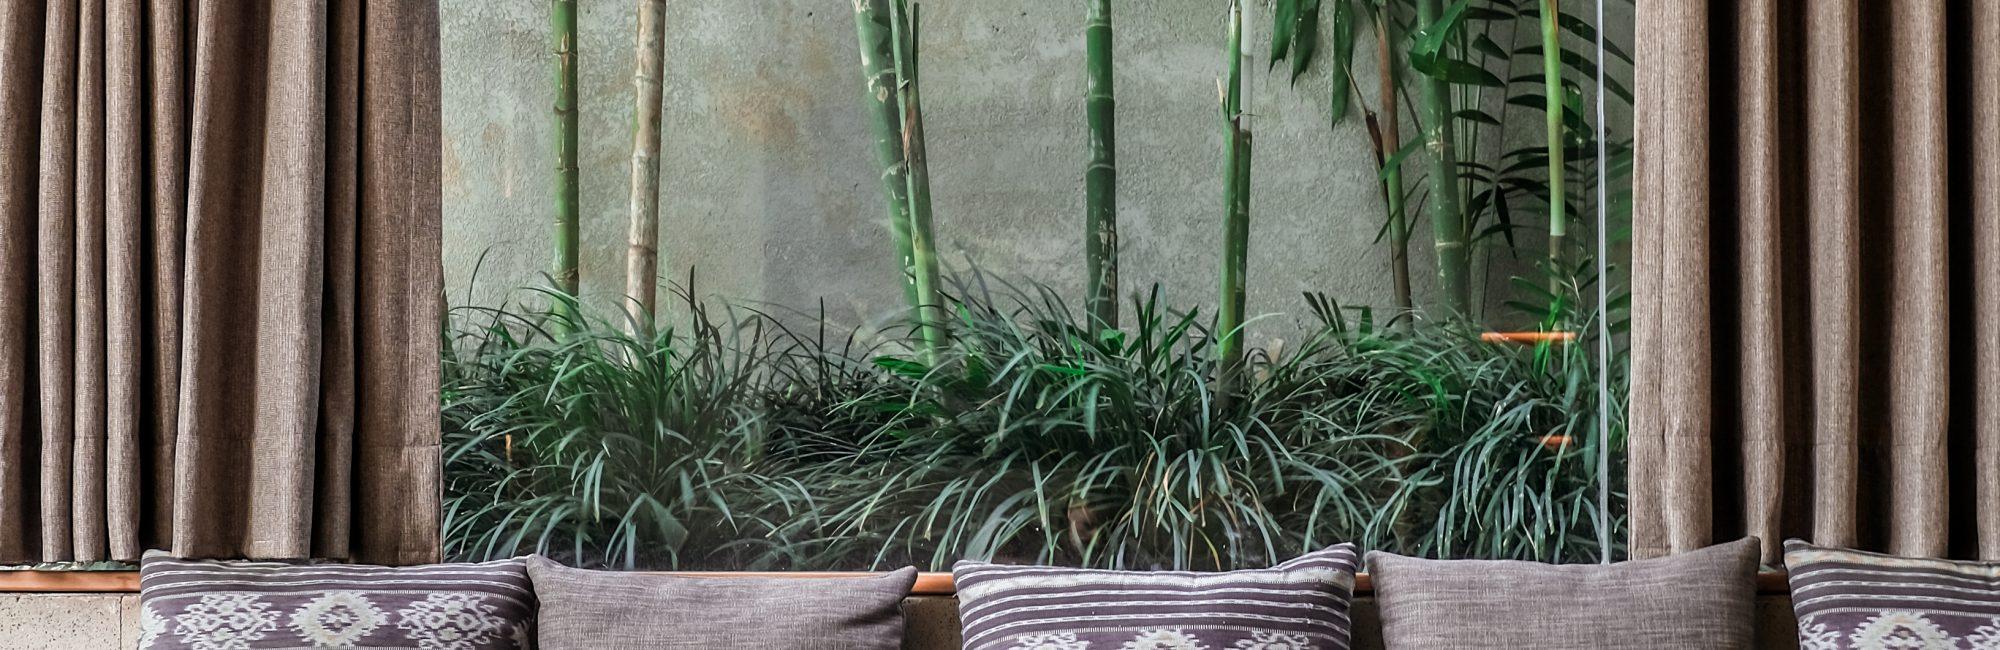 Sooka Interior Bali Journey